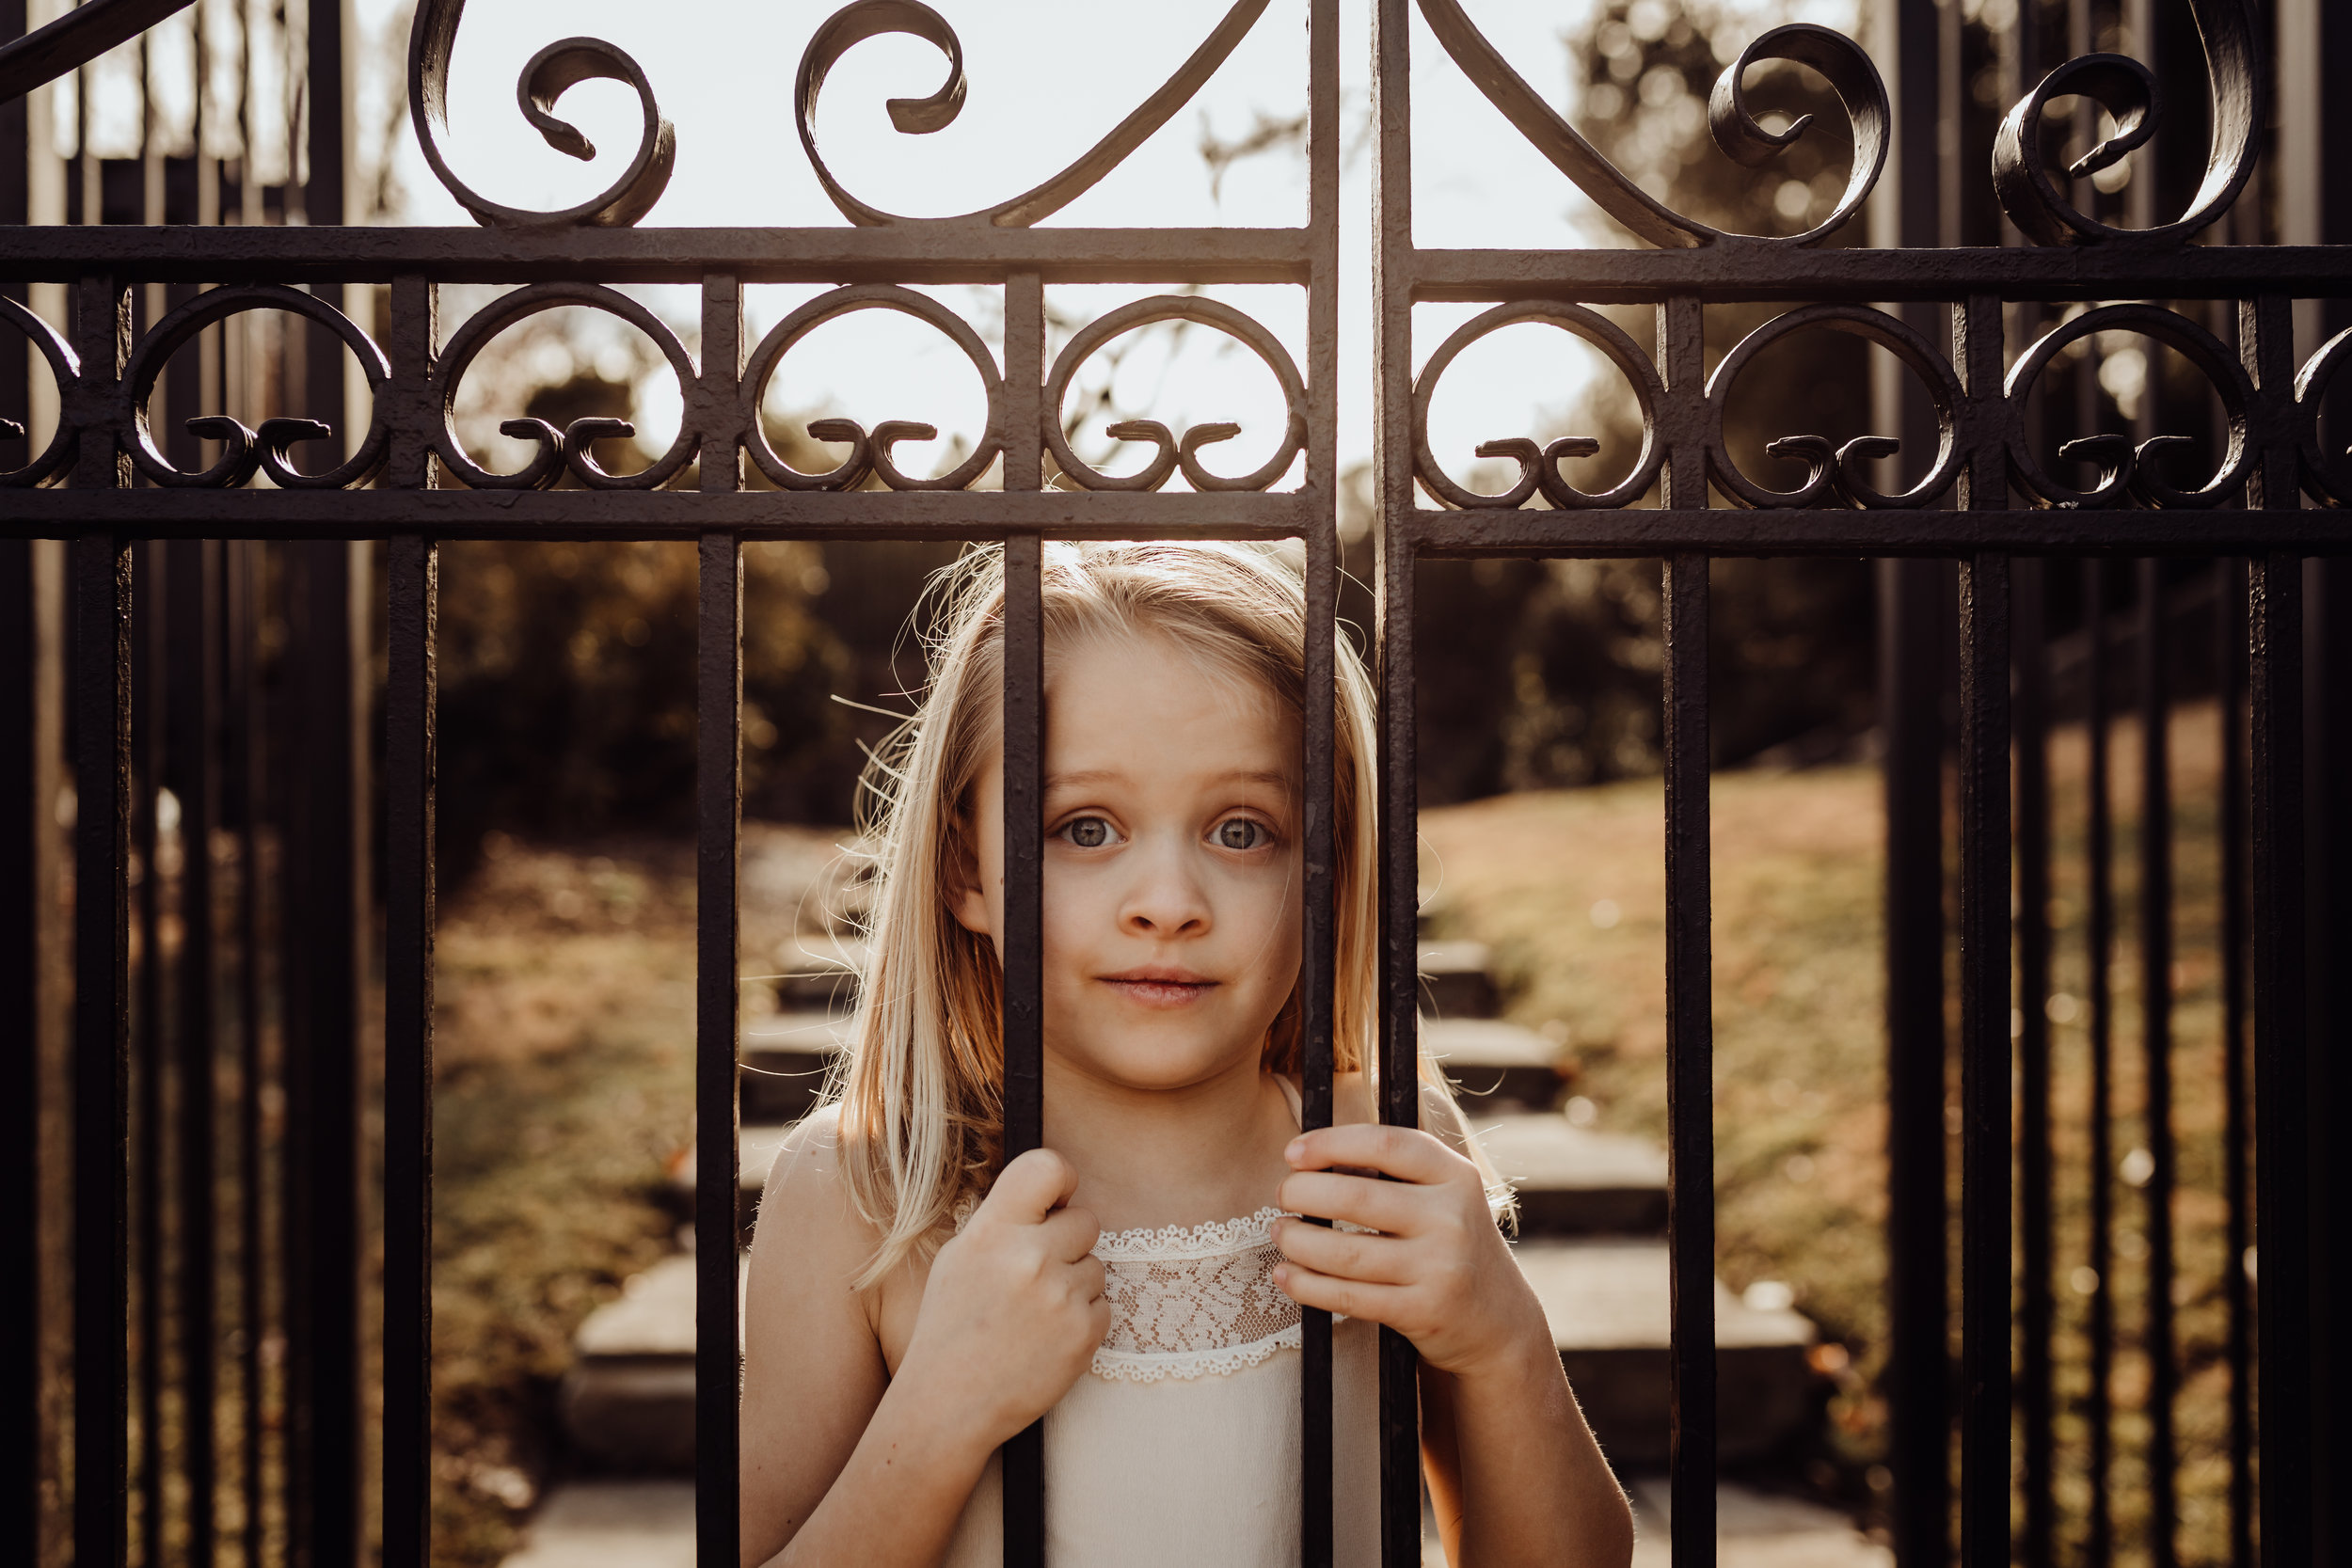 BrandiMarkhamPhotography_Rockville_Maryland_Lifestyle_Family15.jpg